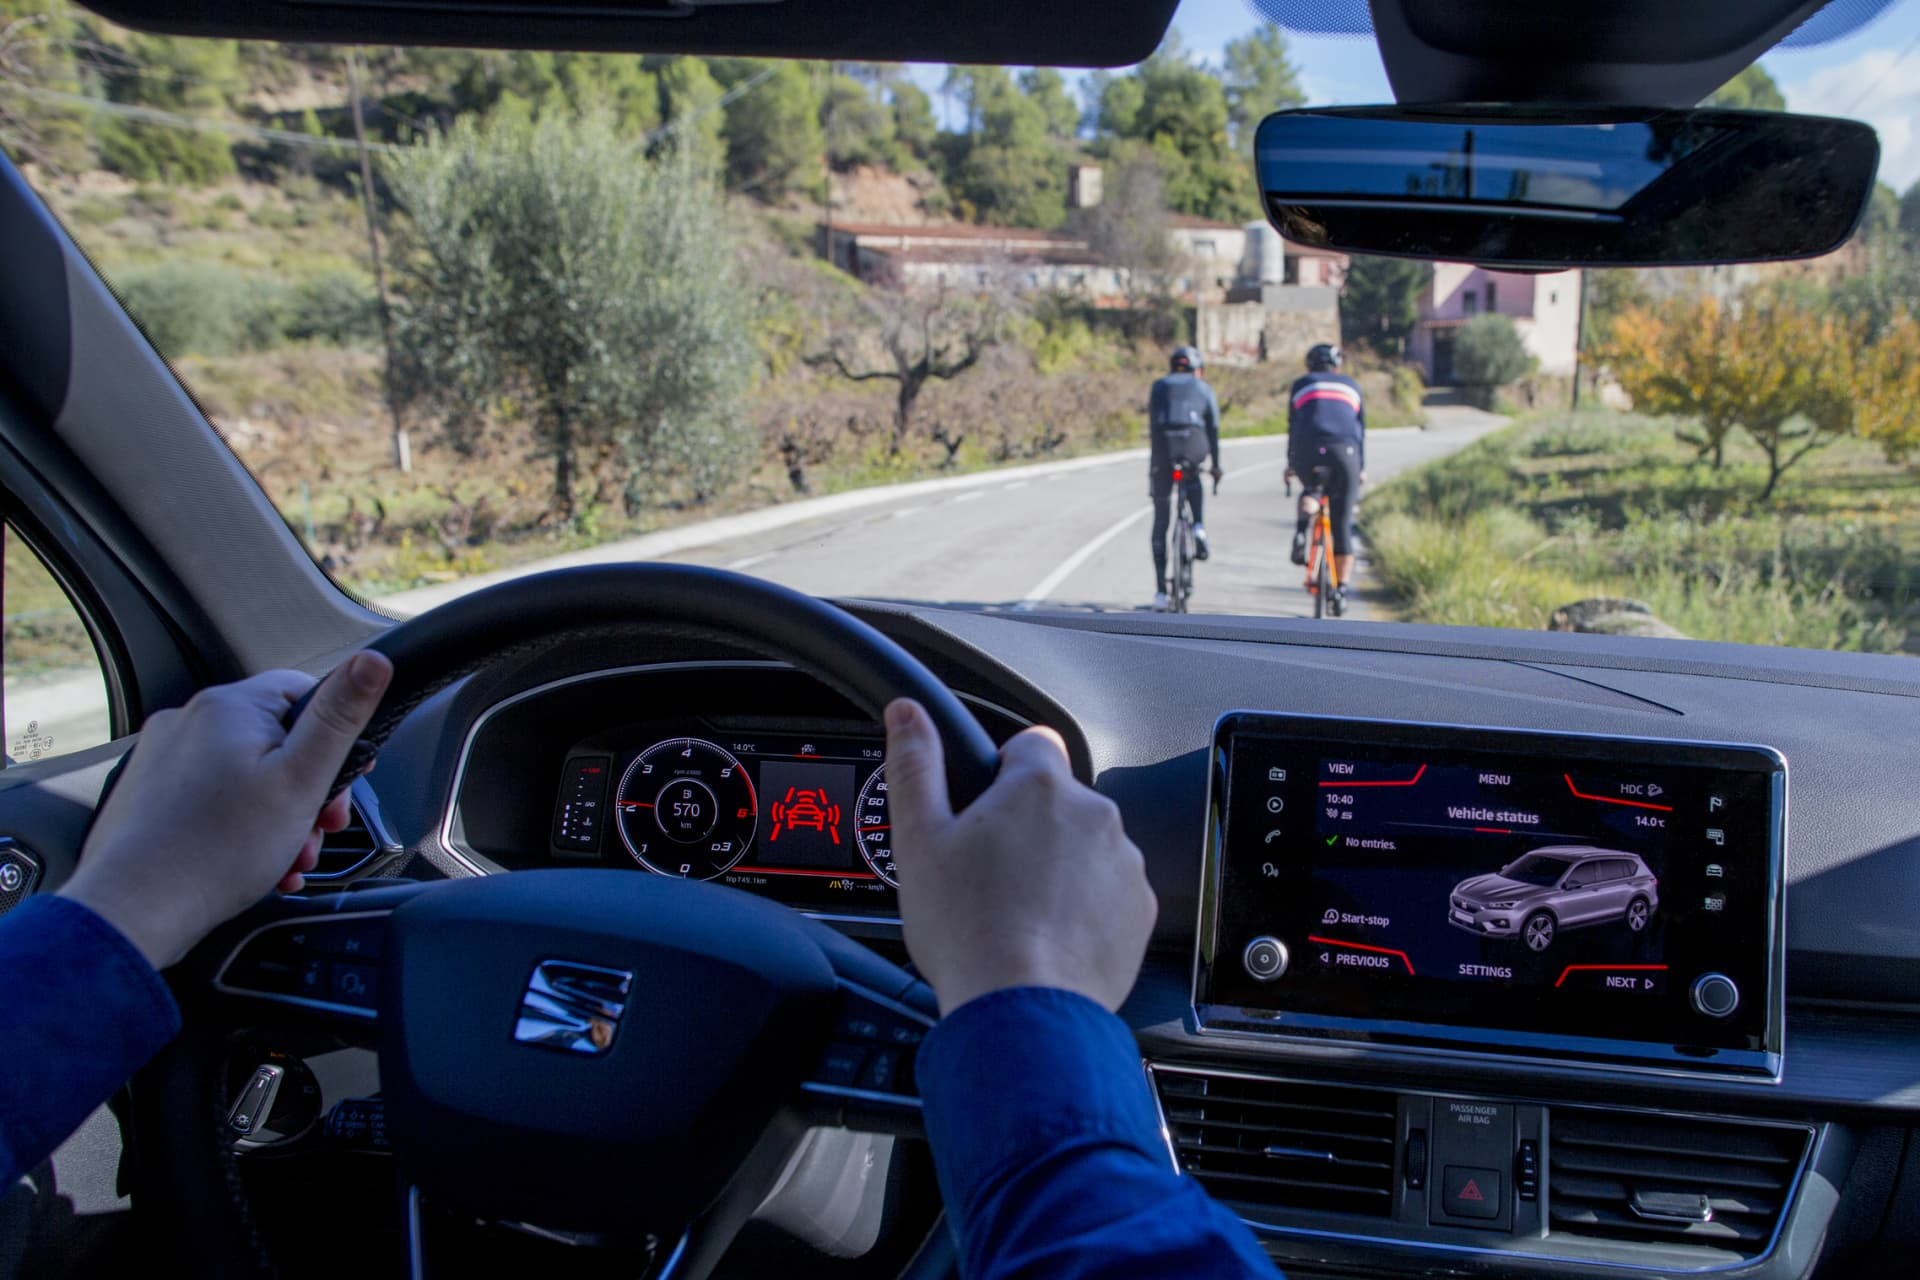 Adelantar Correctamente Ciclistas Biciletas 06